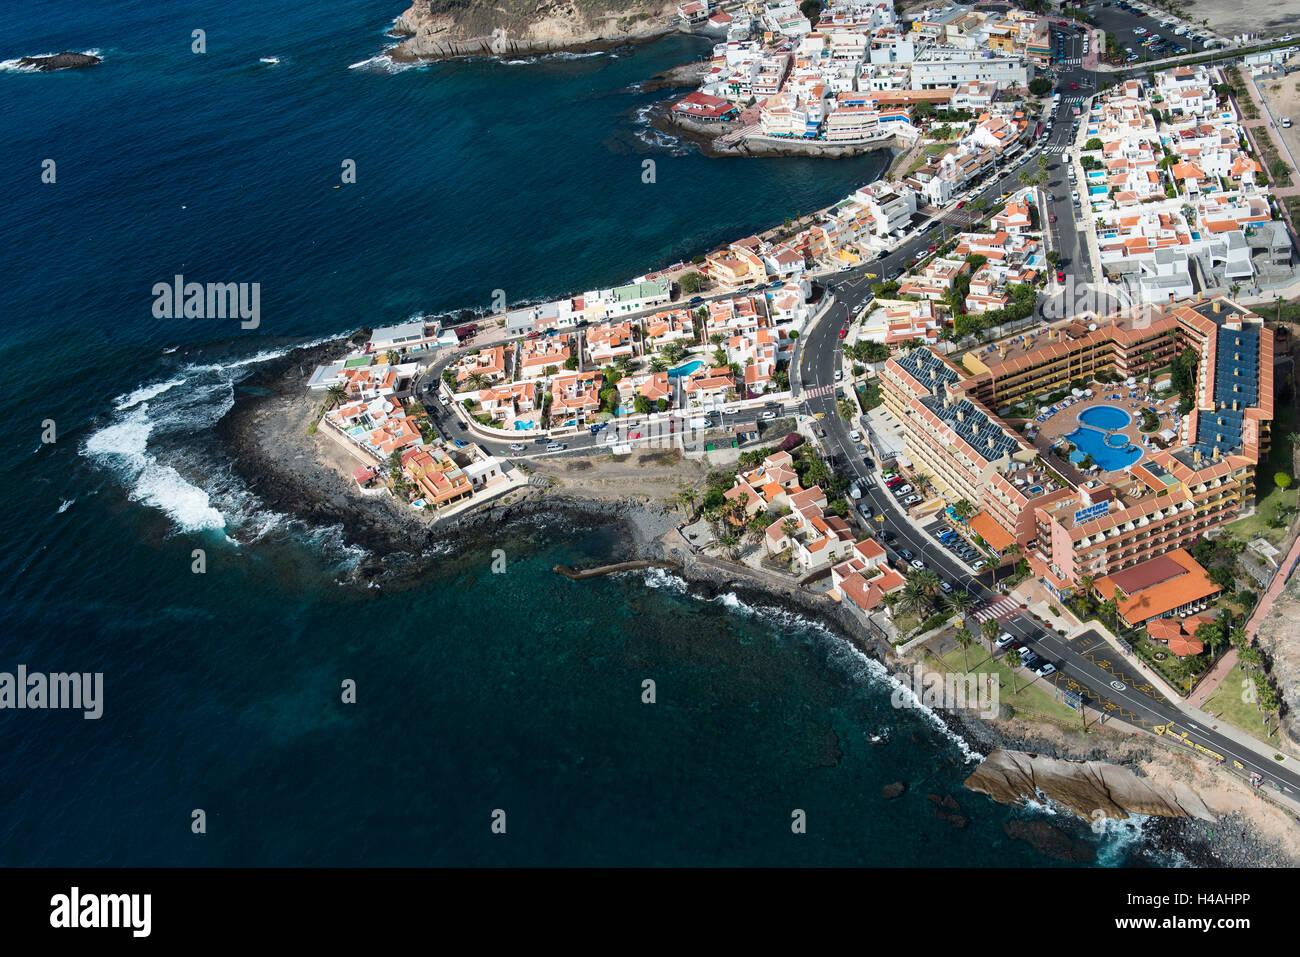 Tenerife la caleta hotel jardin caleta aerial picture for Hotel jardin la caleta tenerife